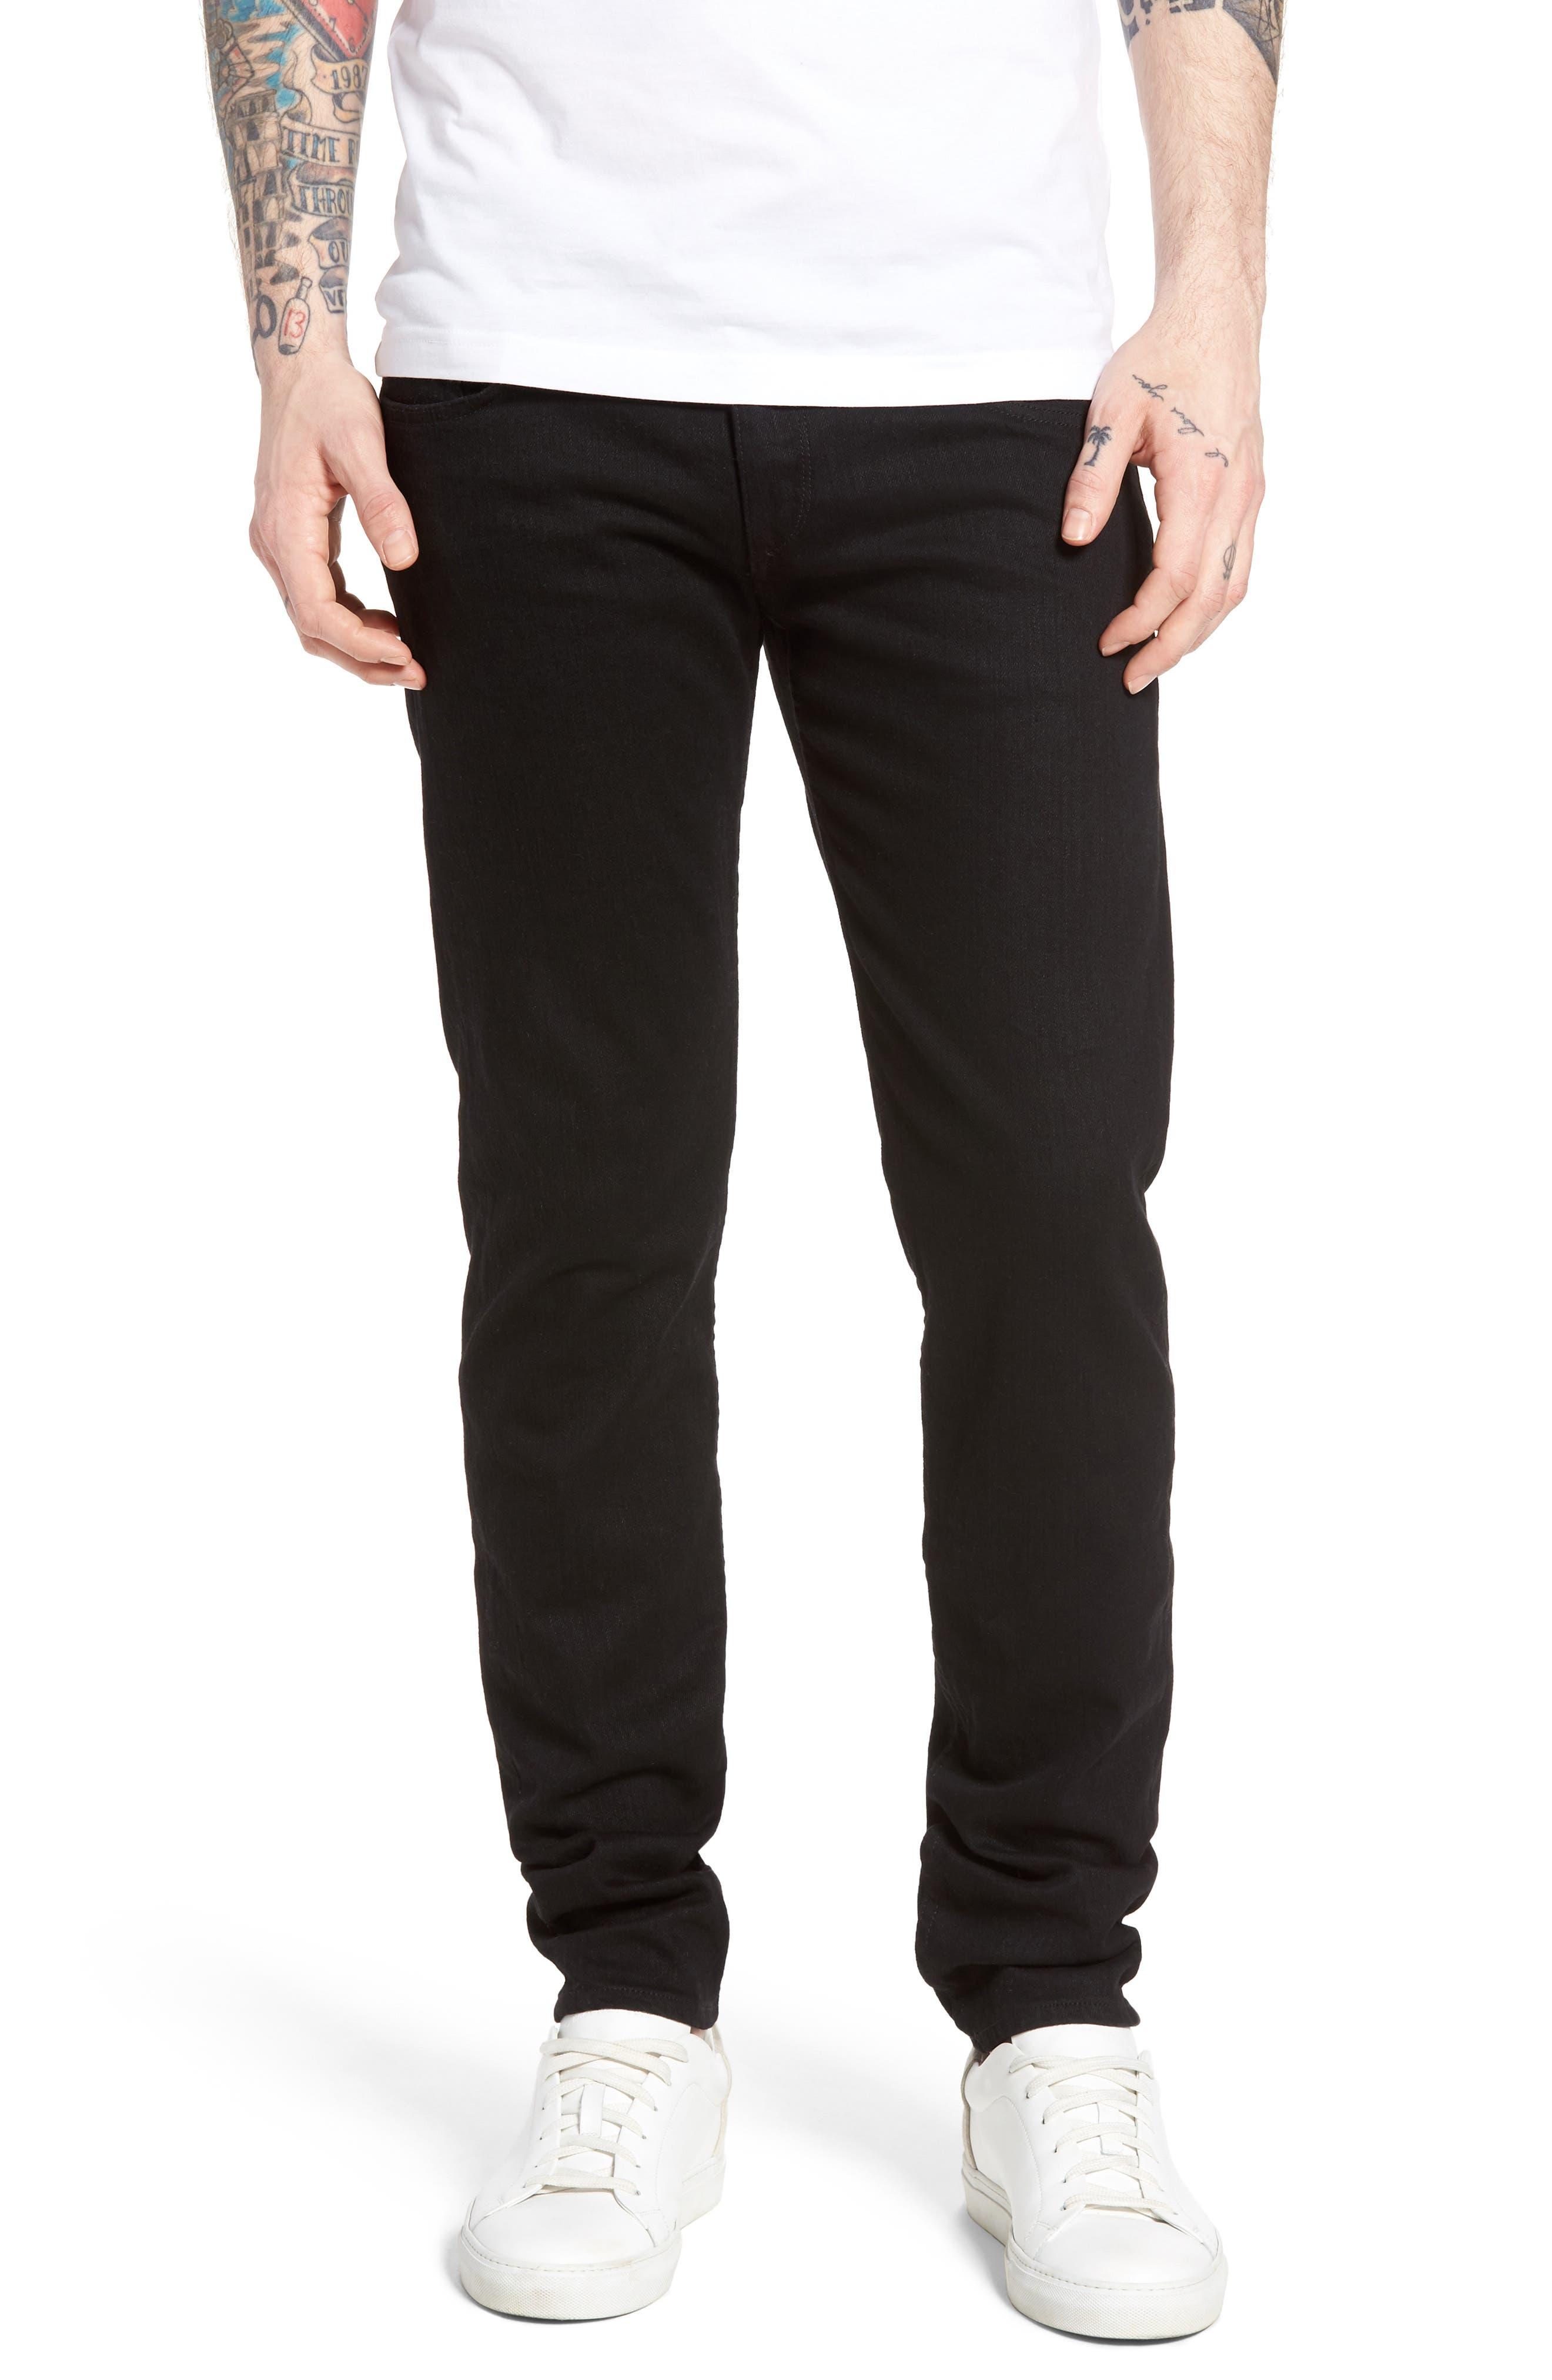 Alternate Image 1 Selected - rag & bone Standard Issue Fit 1 Skinny Fit Jeans